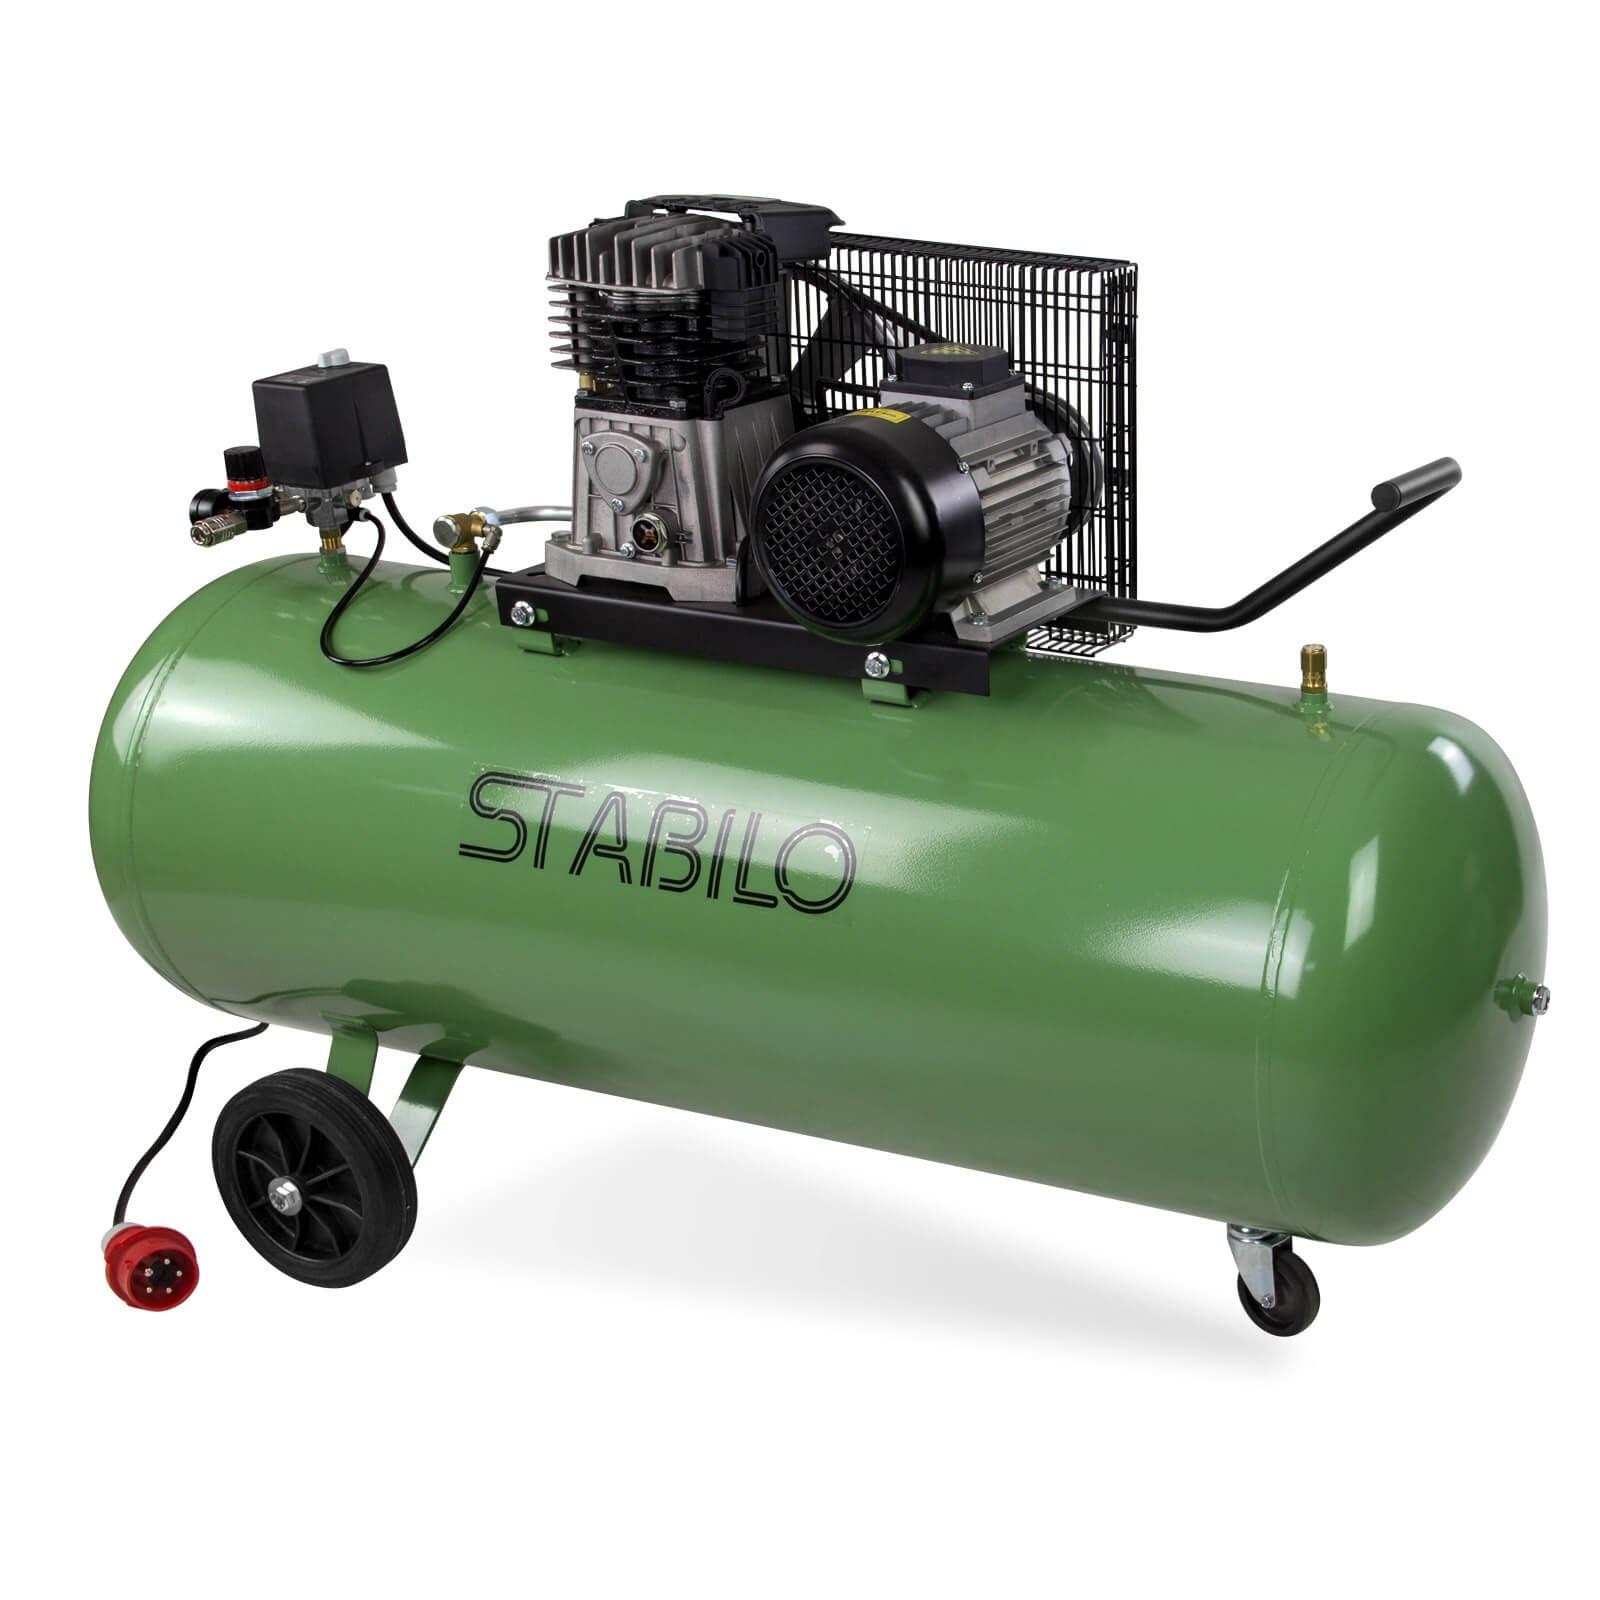 STABILO Druckluft Kompressor Kolbenkompressor Druckluftkompressor 500/10/200 400V 24212